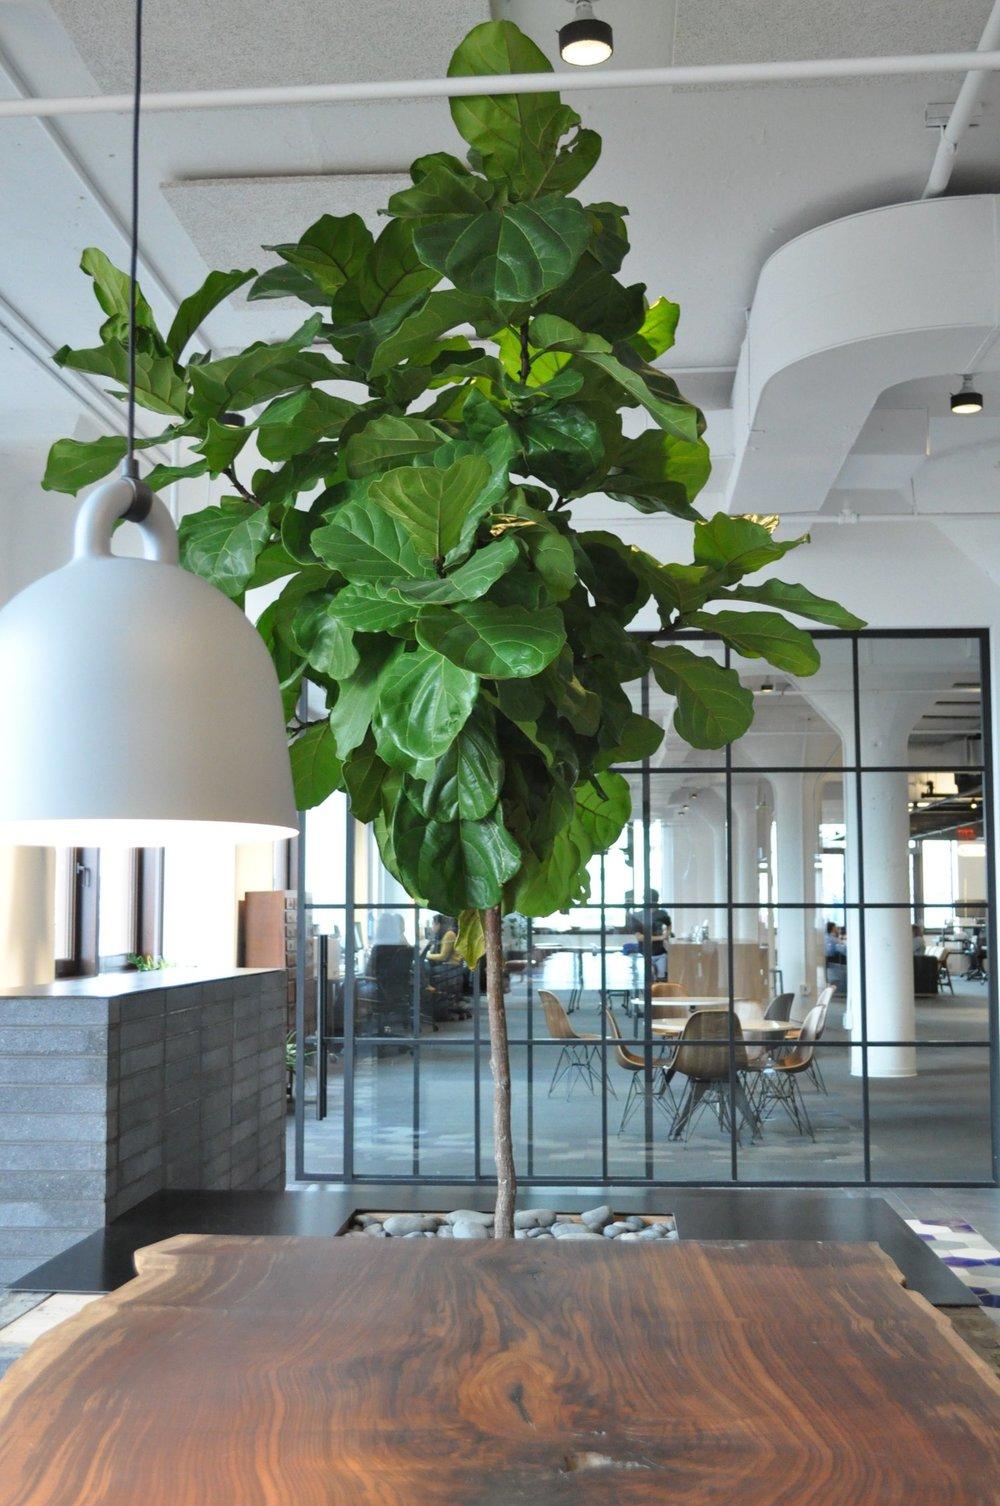 Nyc Indoor Tree Interior Landscape